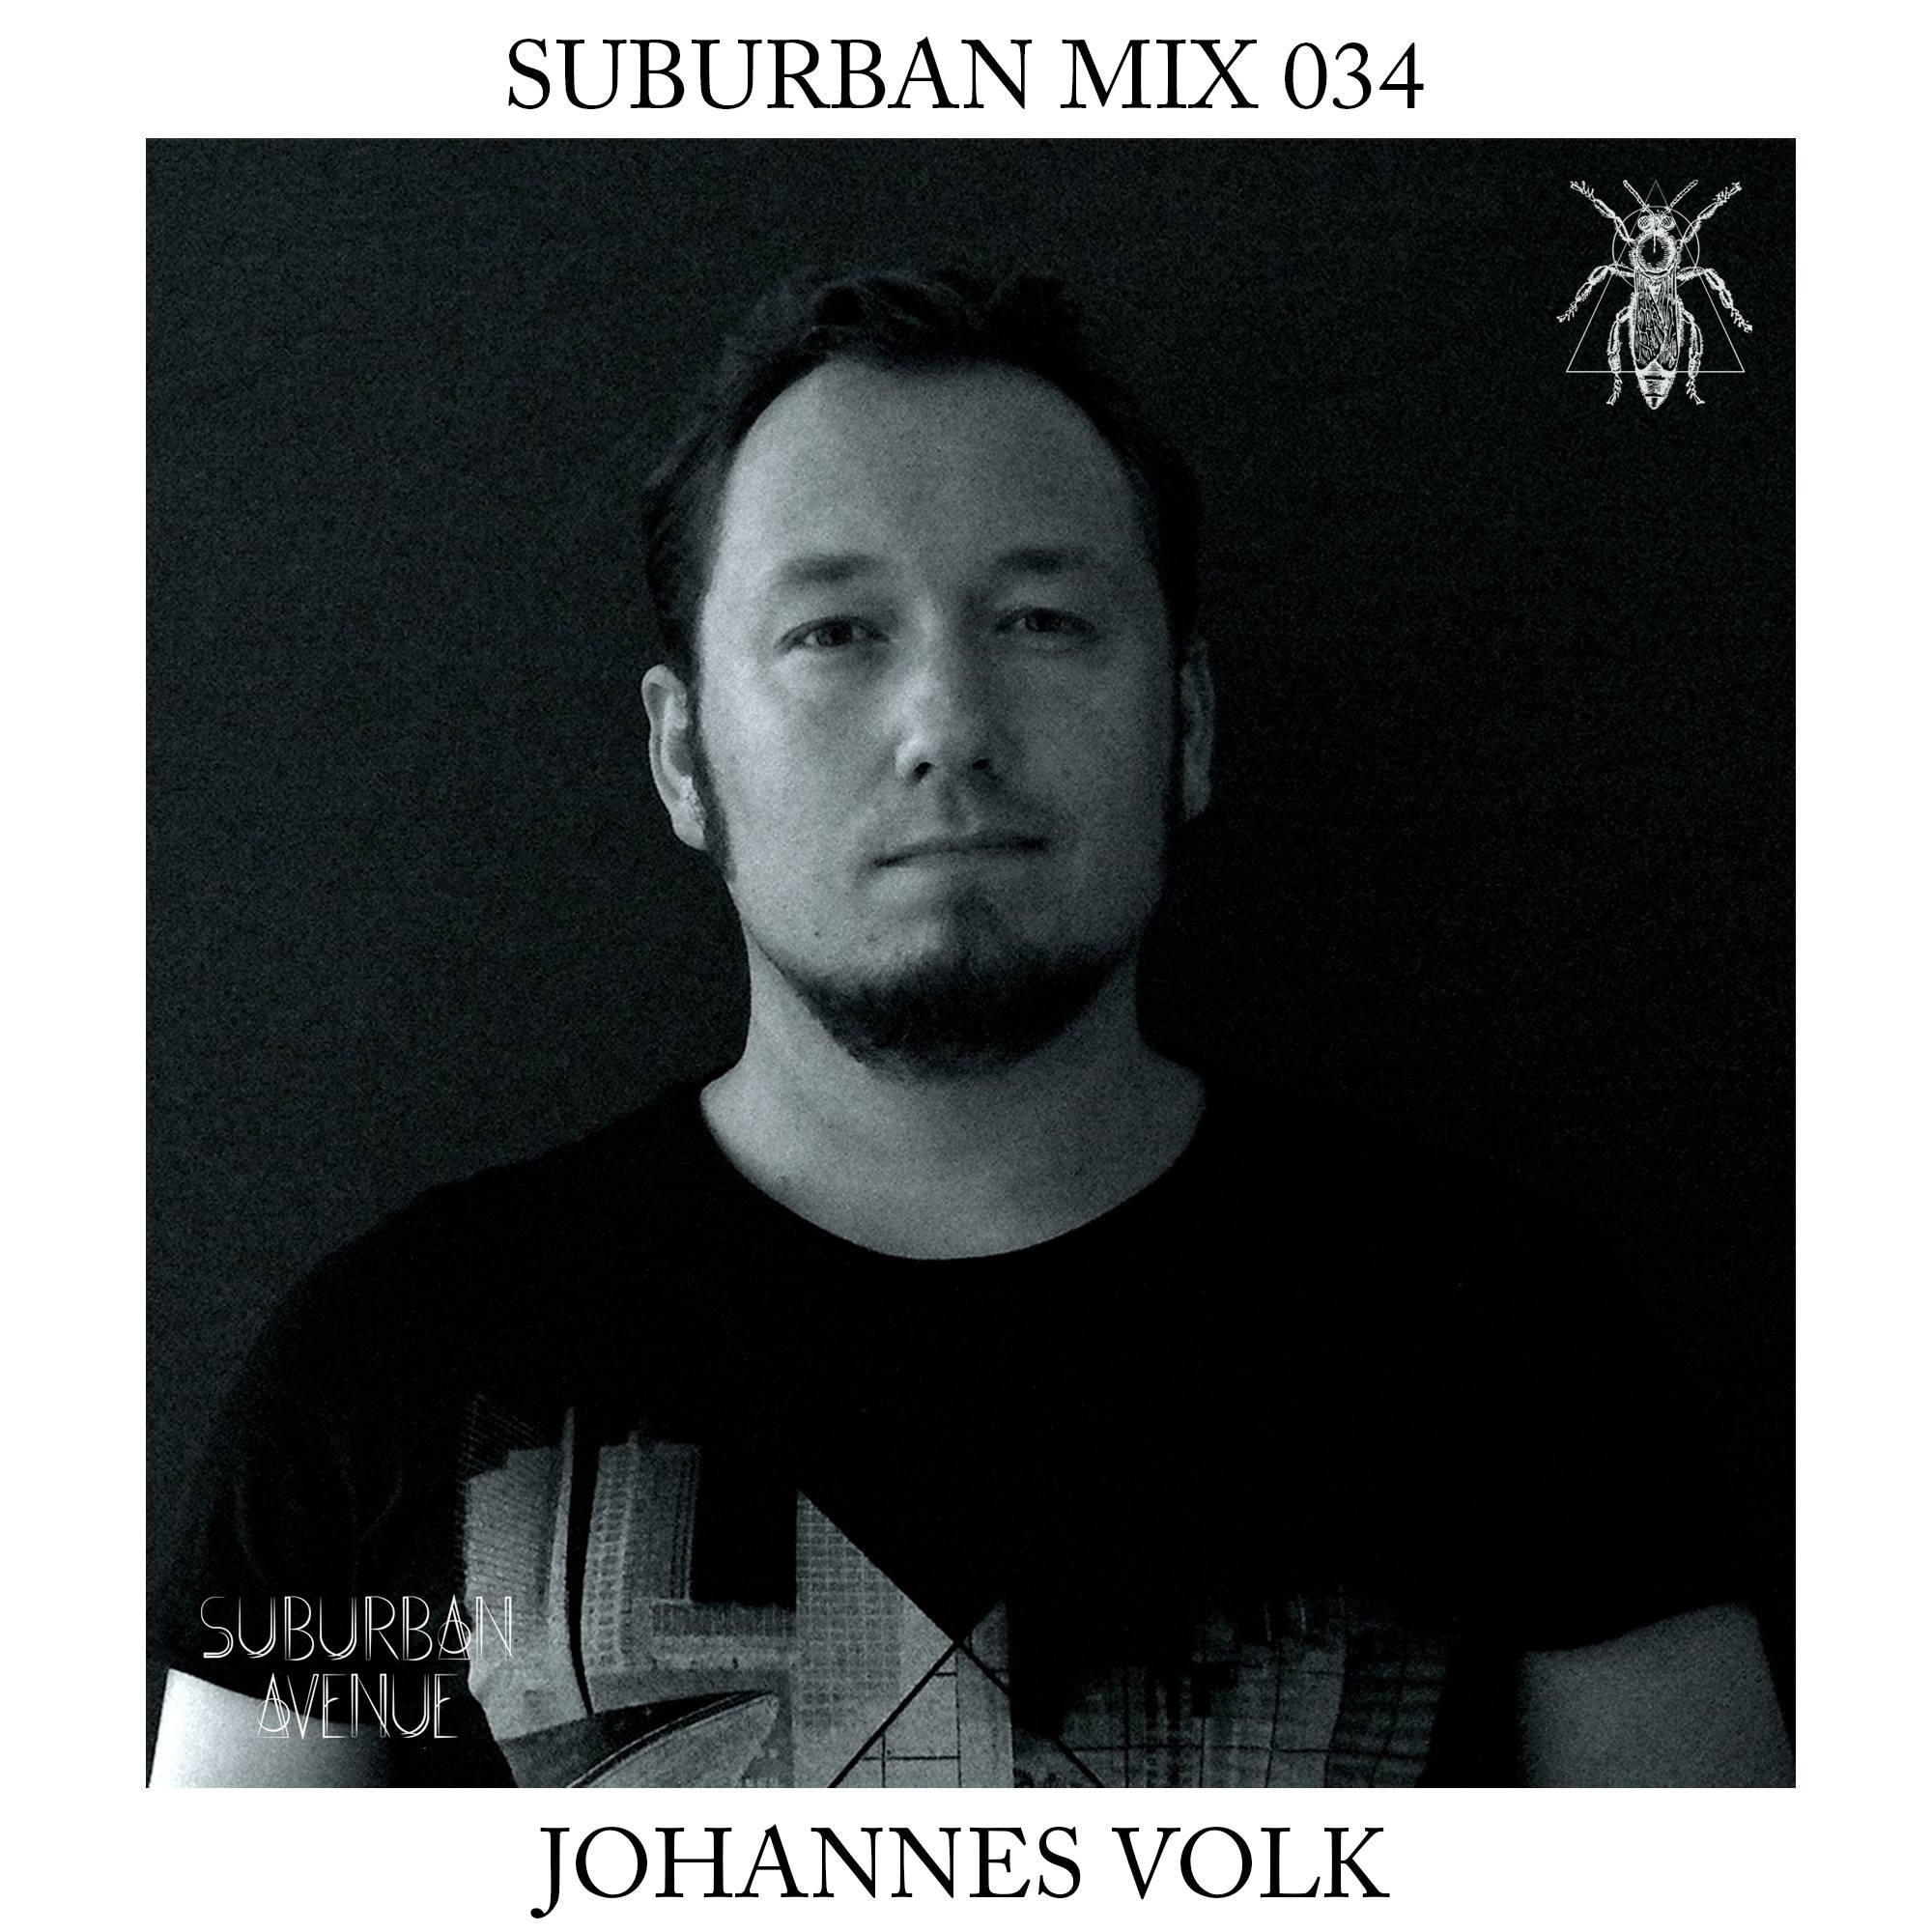 Suburban Mix 034 - Johannes Volk